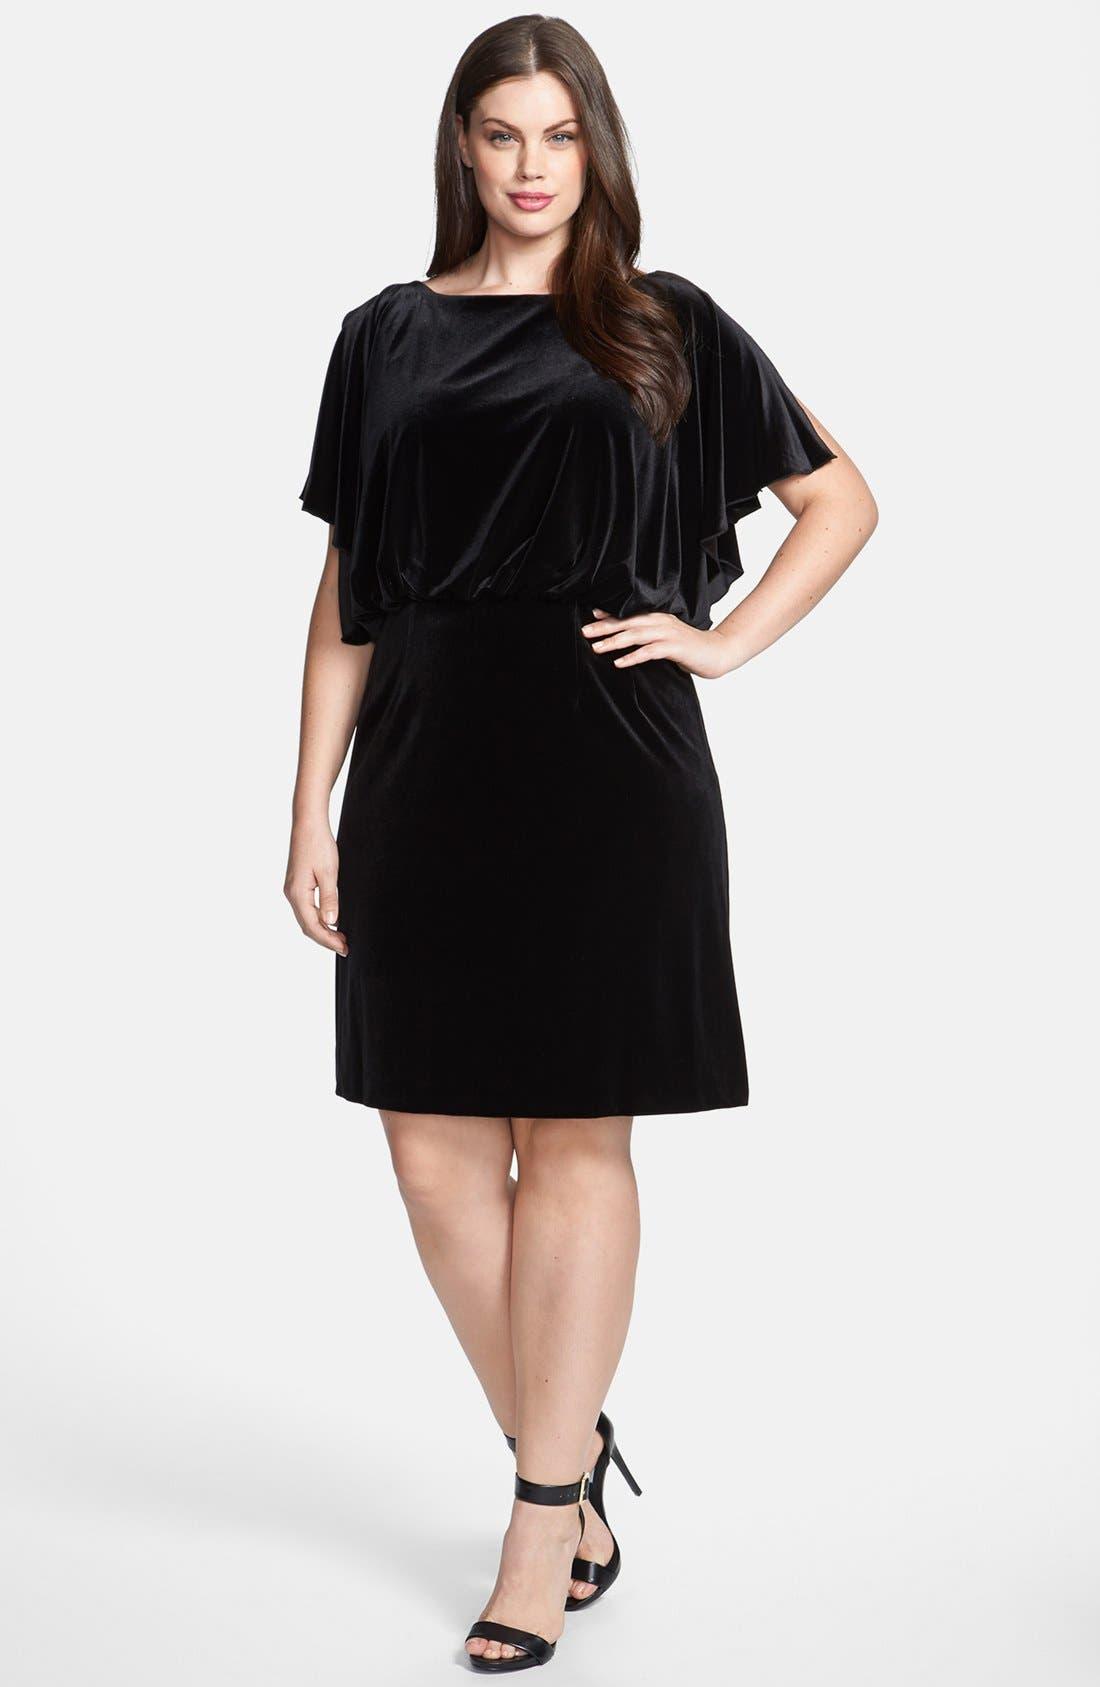 Alternate Image 1 Selected - Jessica Simpson Velvet Batwing Blouson Dress (Plus Size)